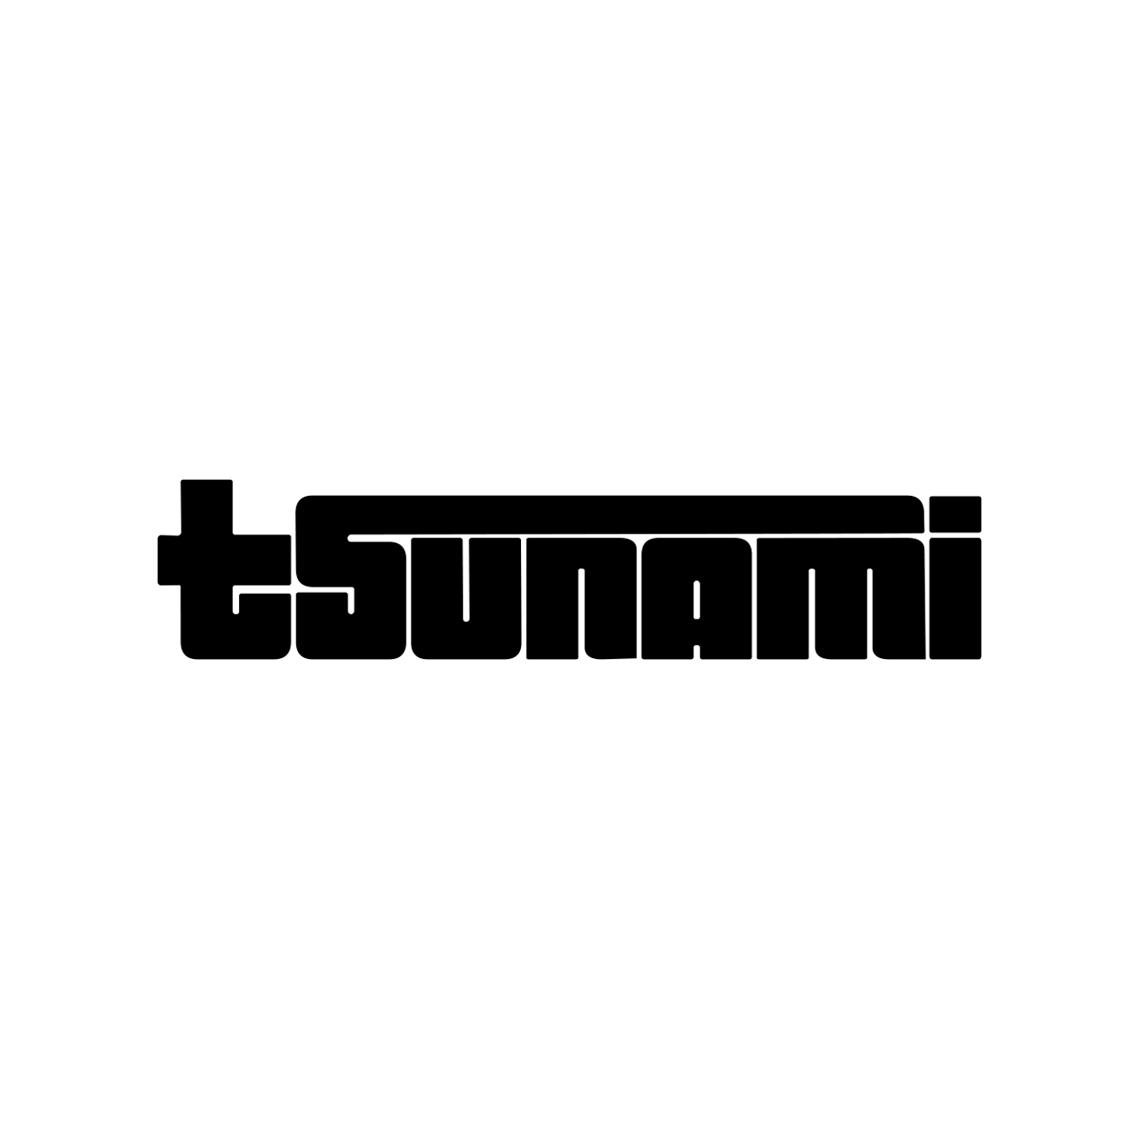 tsunamilogo.jpg